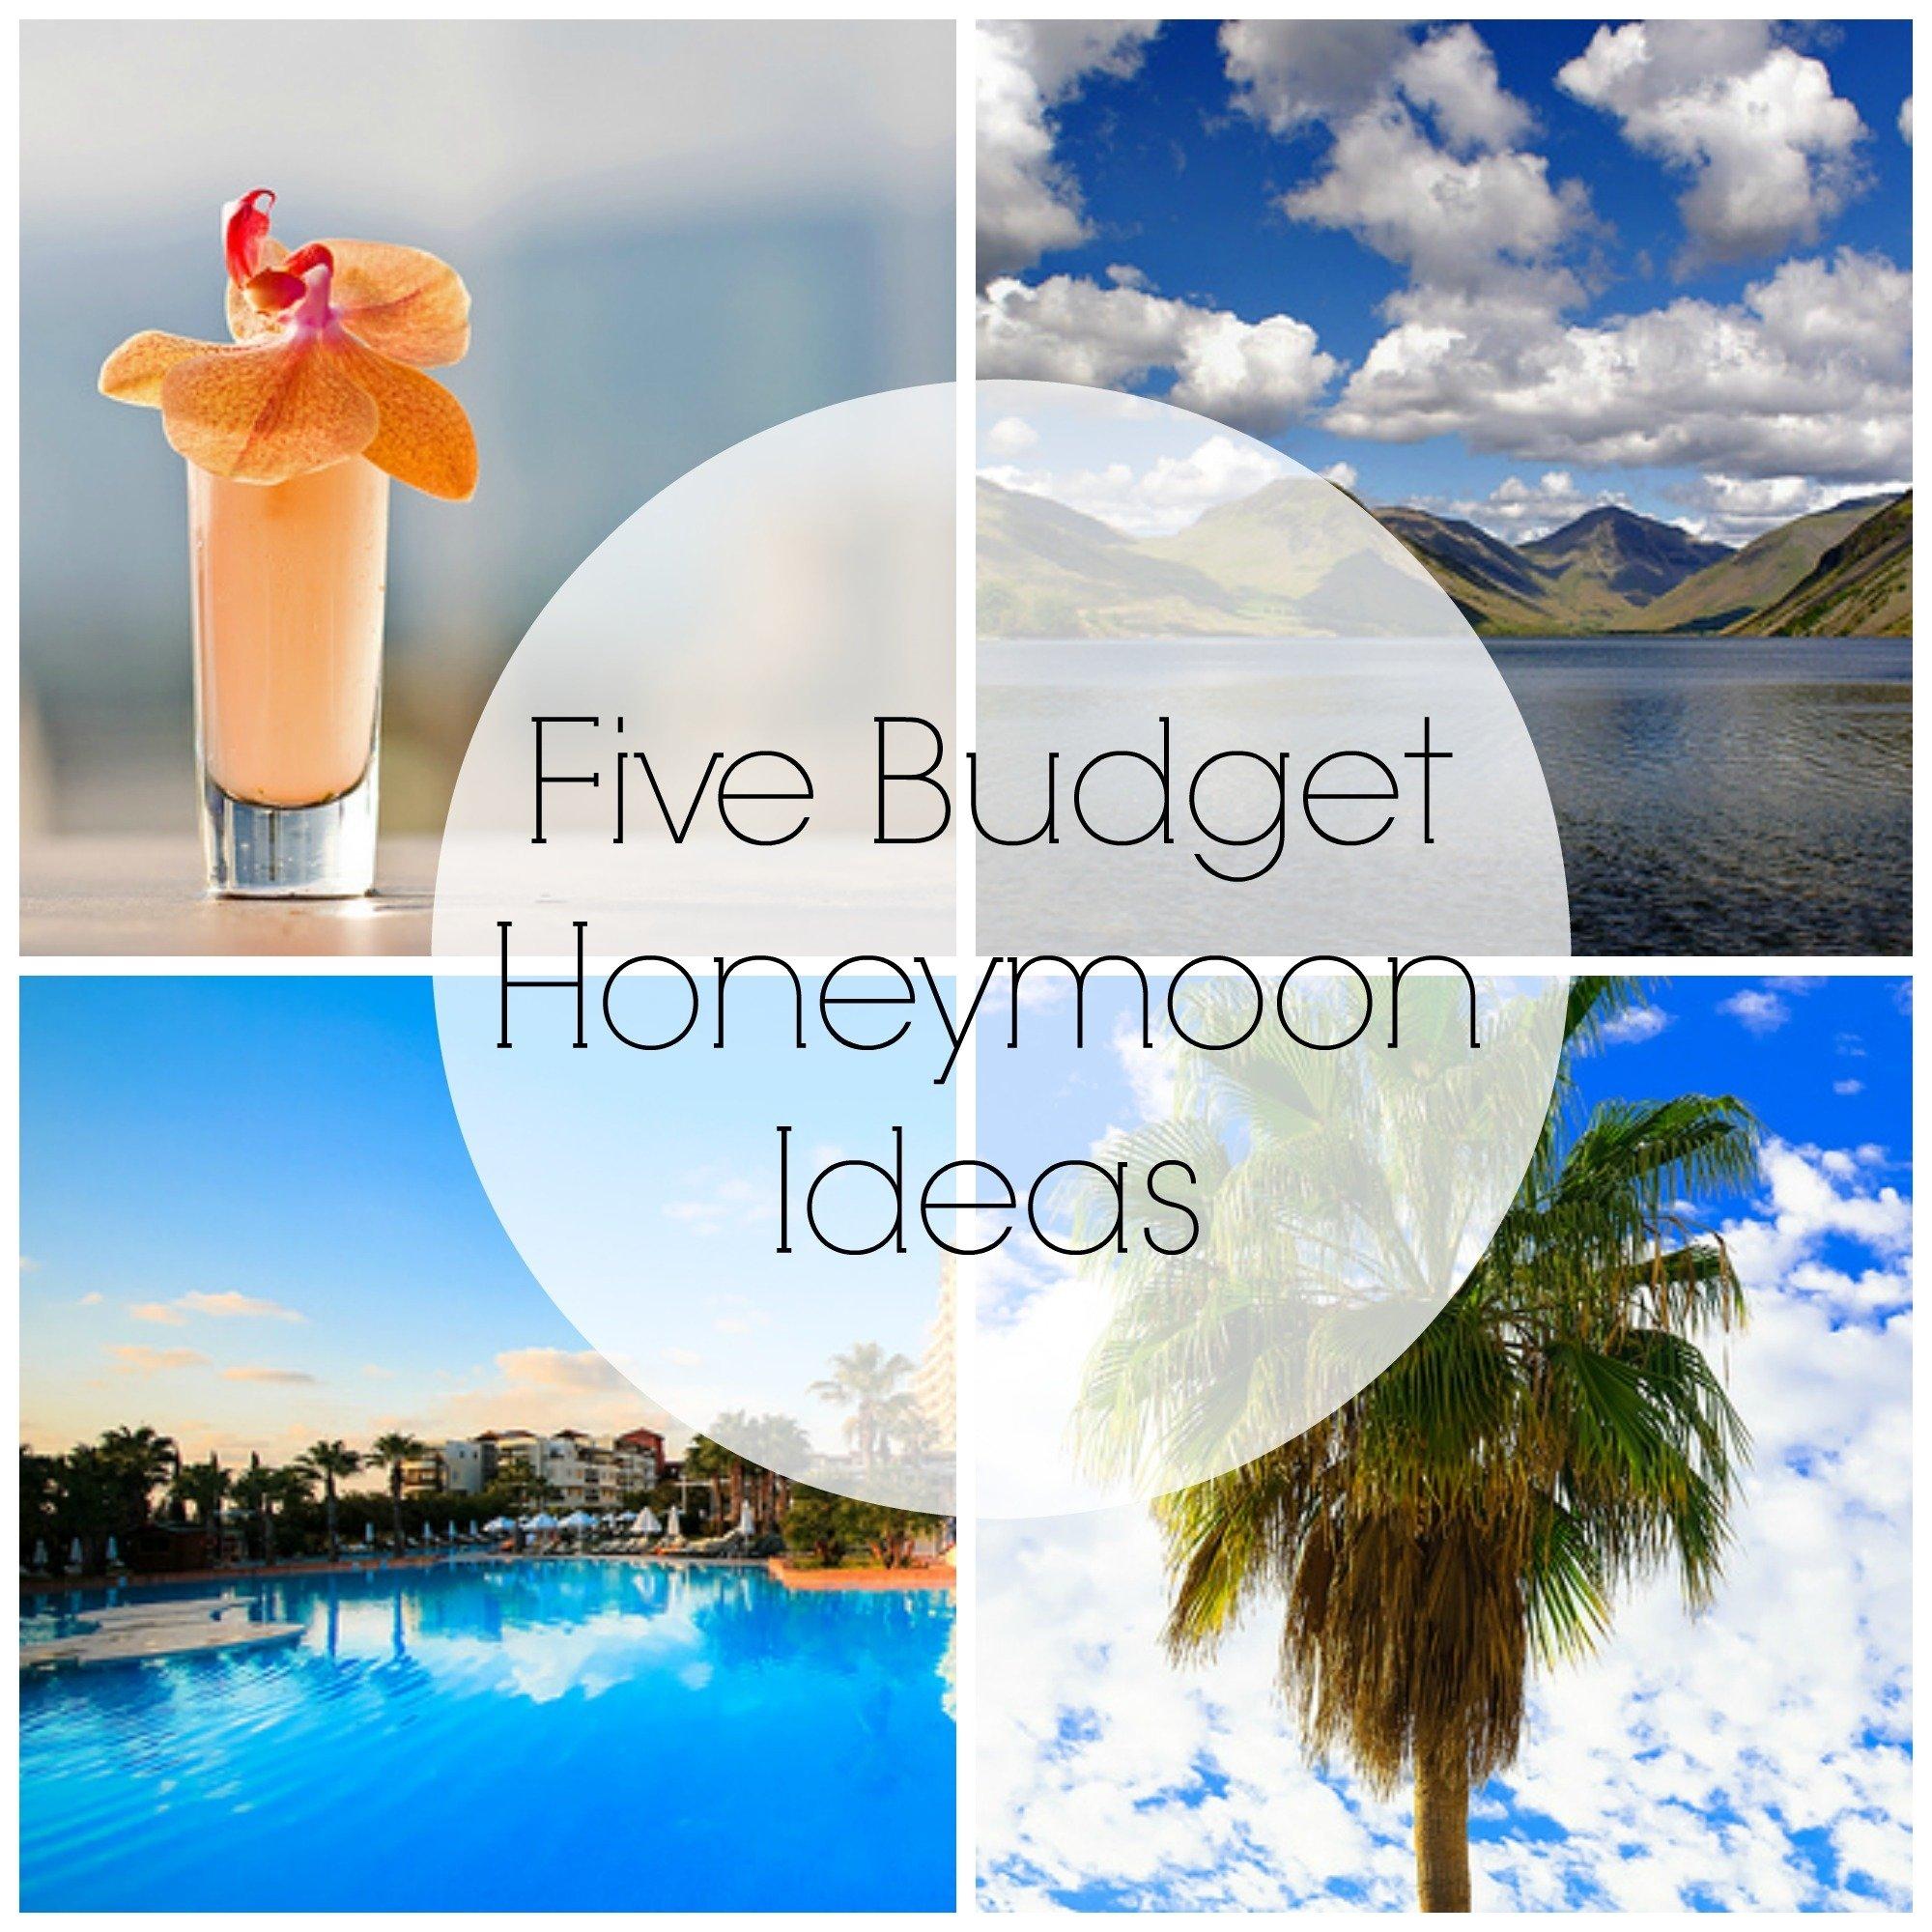 minimoon ideas archives - the budget bride company